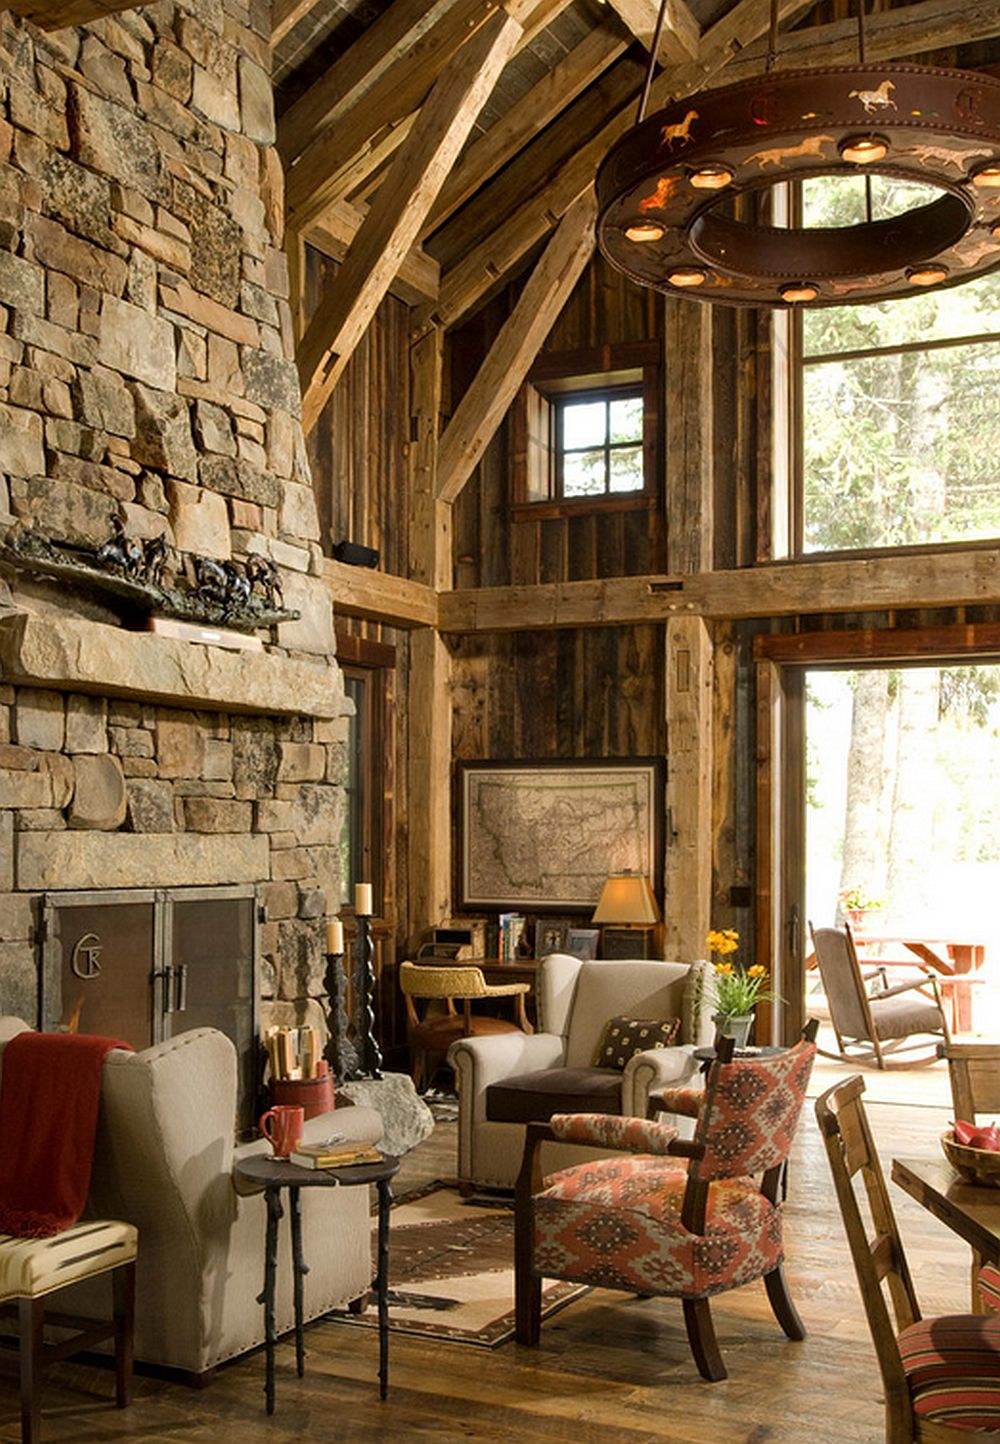 adelaparvu.com despre cabana din lemn vechi recuperat, cabana Swan Valley, Montana, RMT Architects (20)